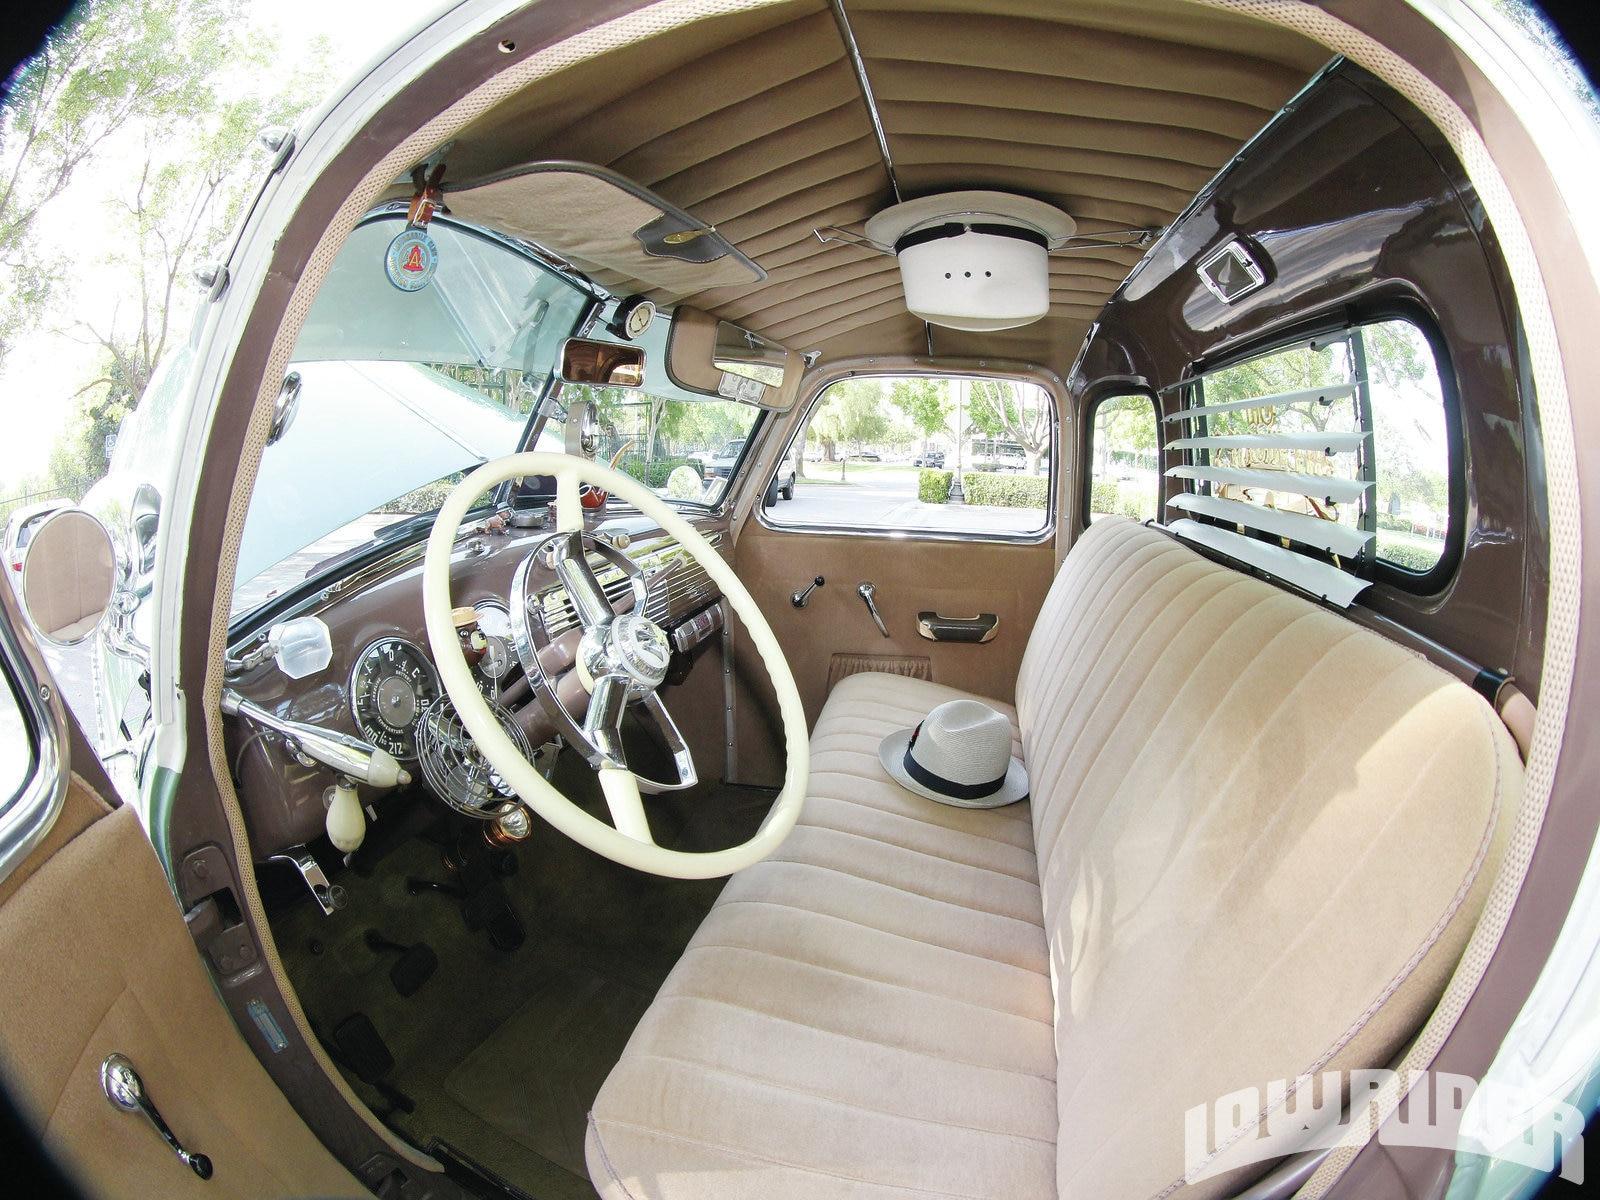 1949 Chevrolet 3100 Pick Up - Lowrider Magazine